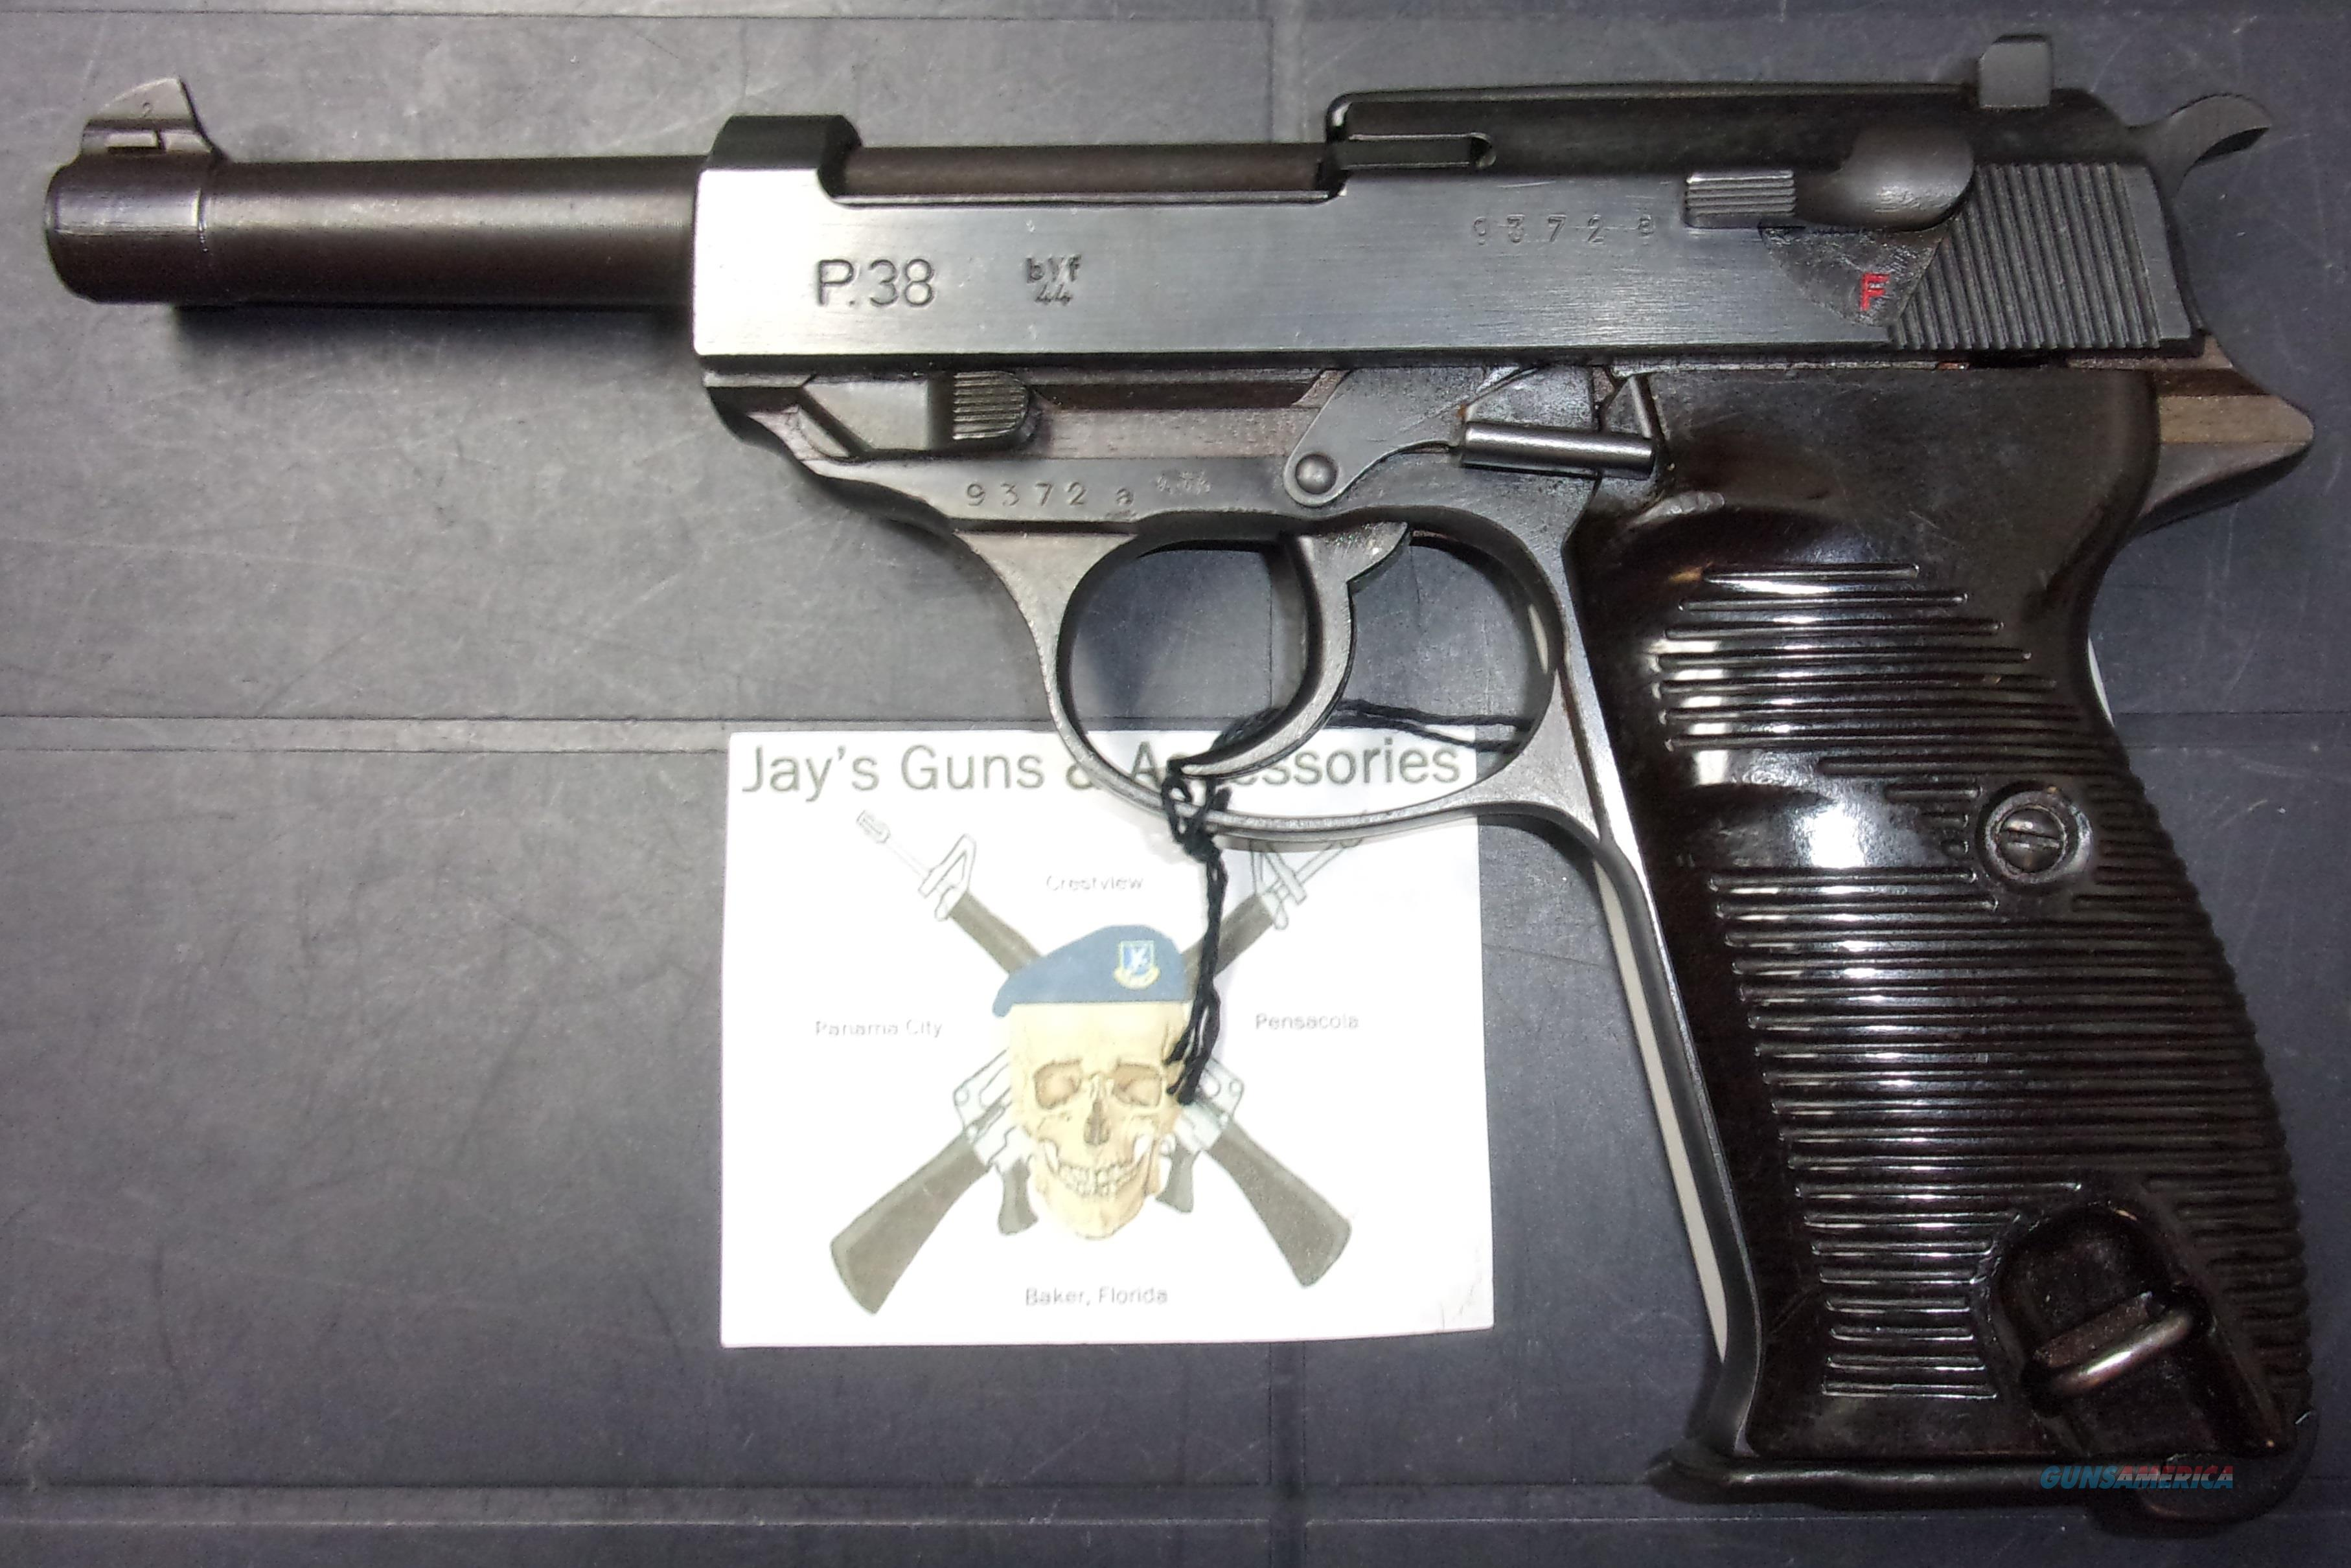 Mauser P-38  Guns > Pistols > Walther Pistols > Pre-1945 > P-38